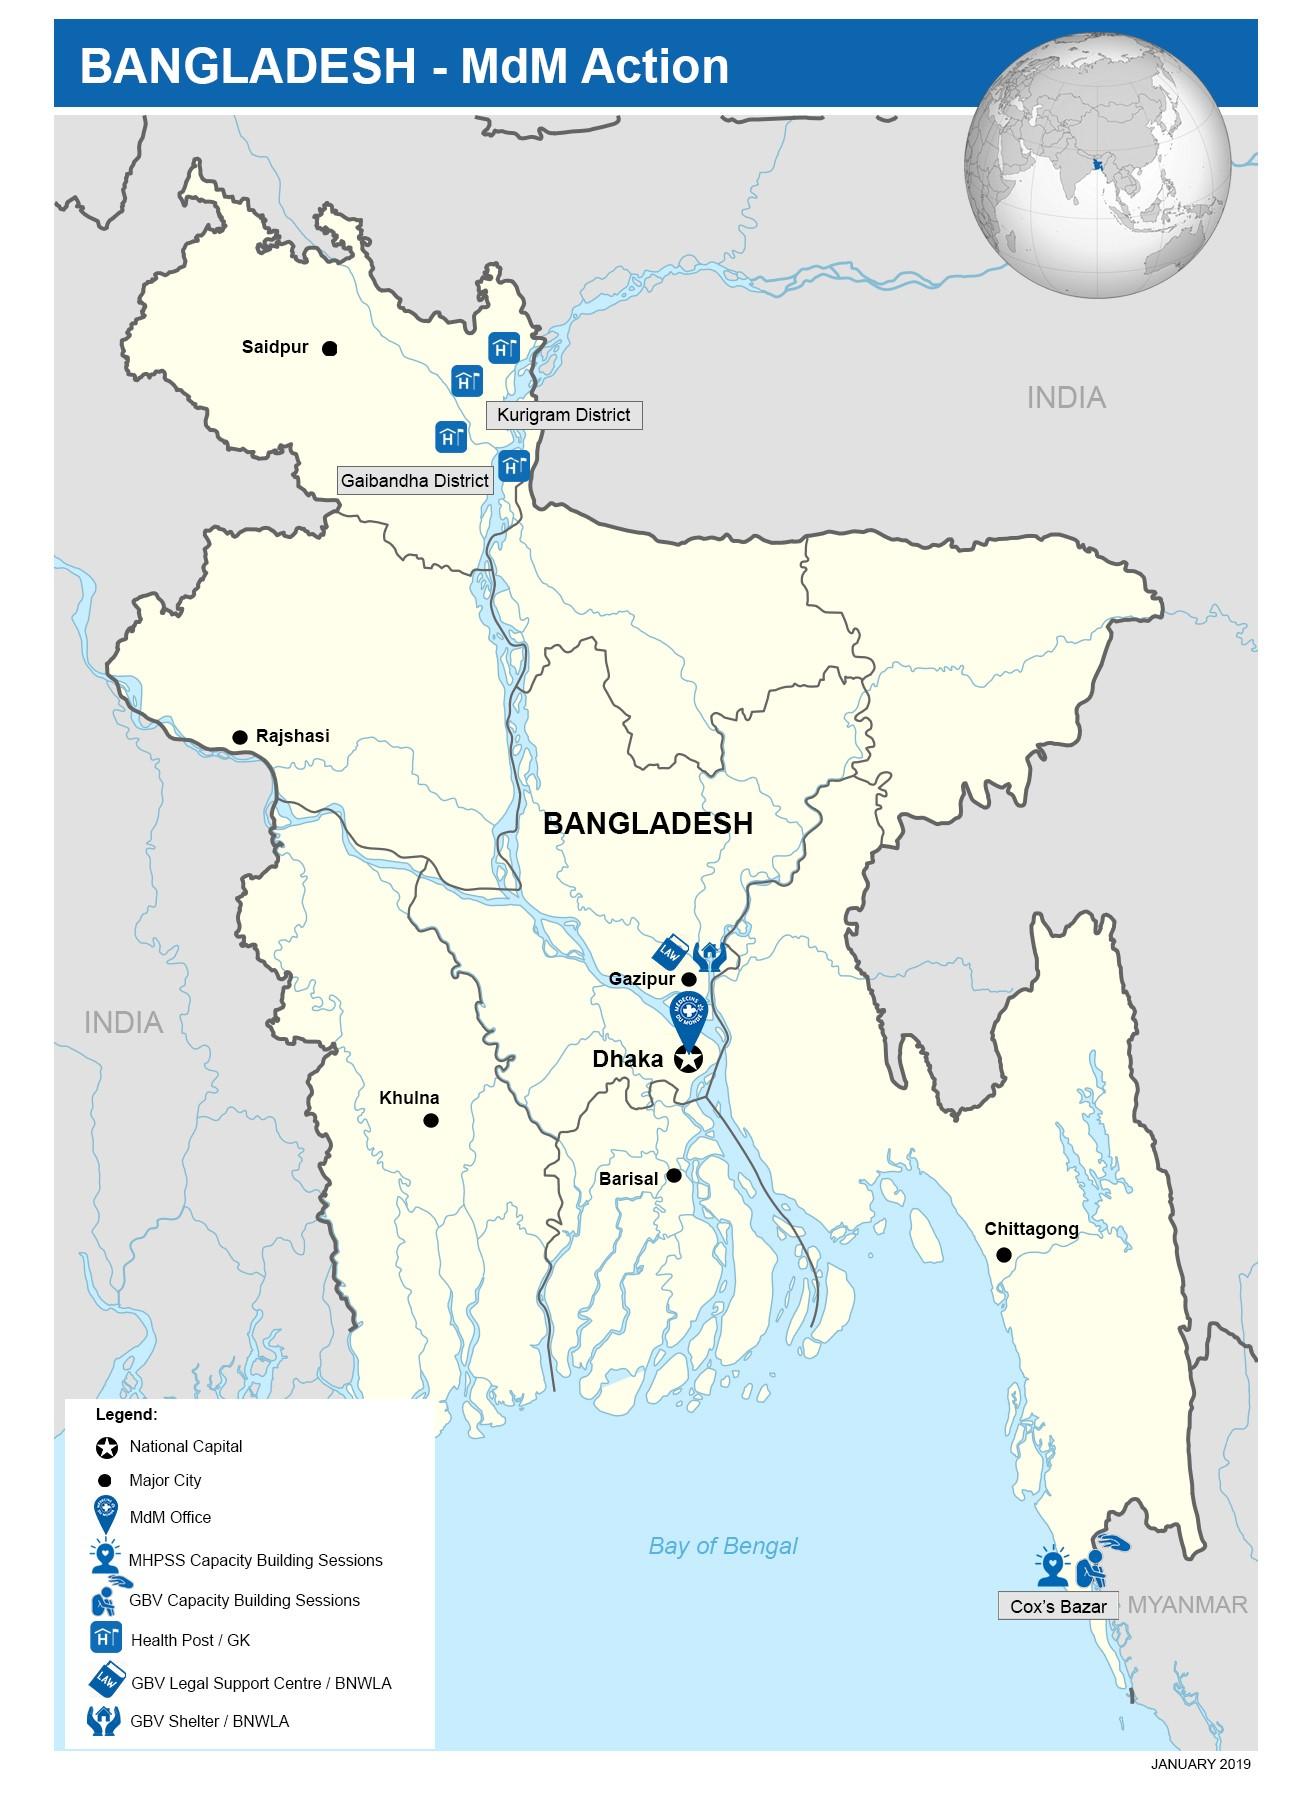 Ärzte der Welt ist an mehreren Orten in Bangladesch aktiv.